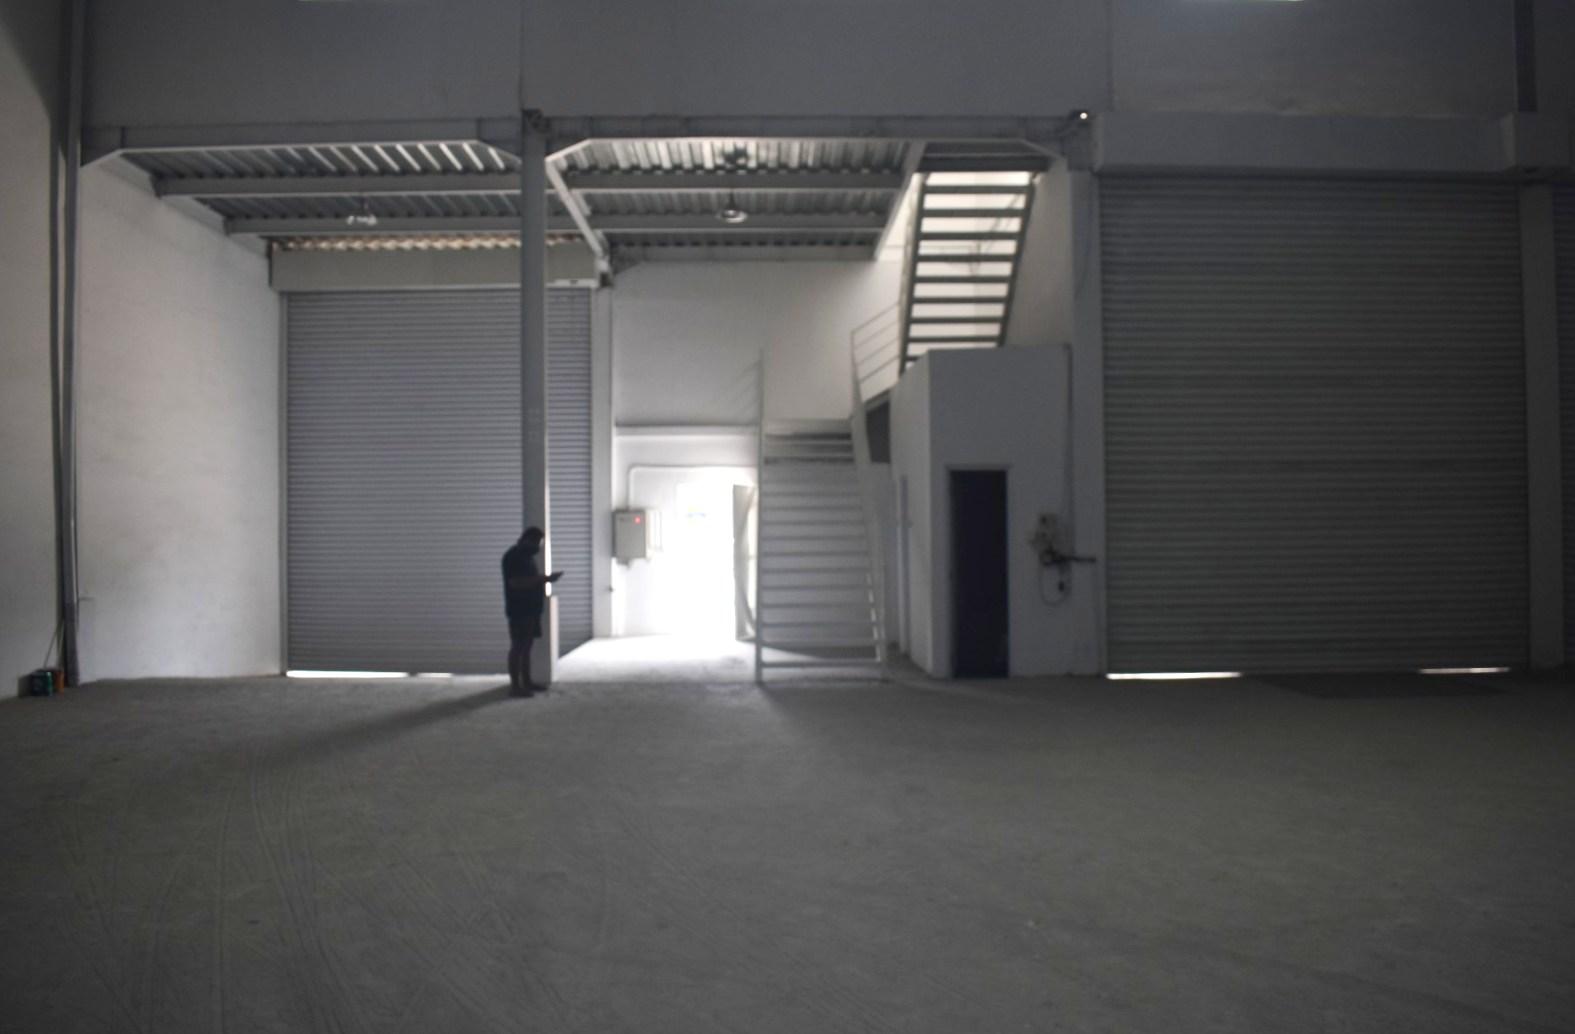 Sewa Gudang Baru Loading Dock Kawasan Industri Delta Silicon Cikarang - 7